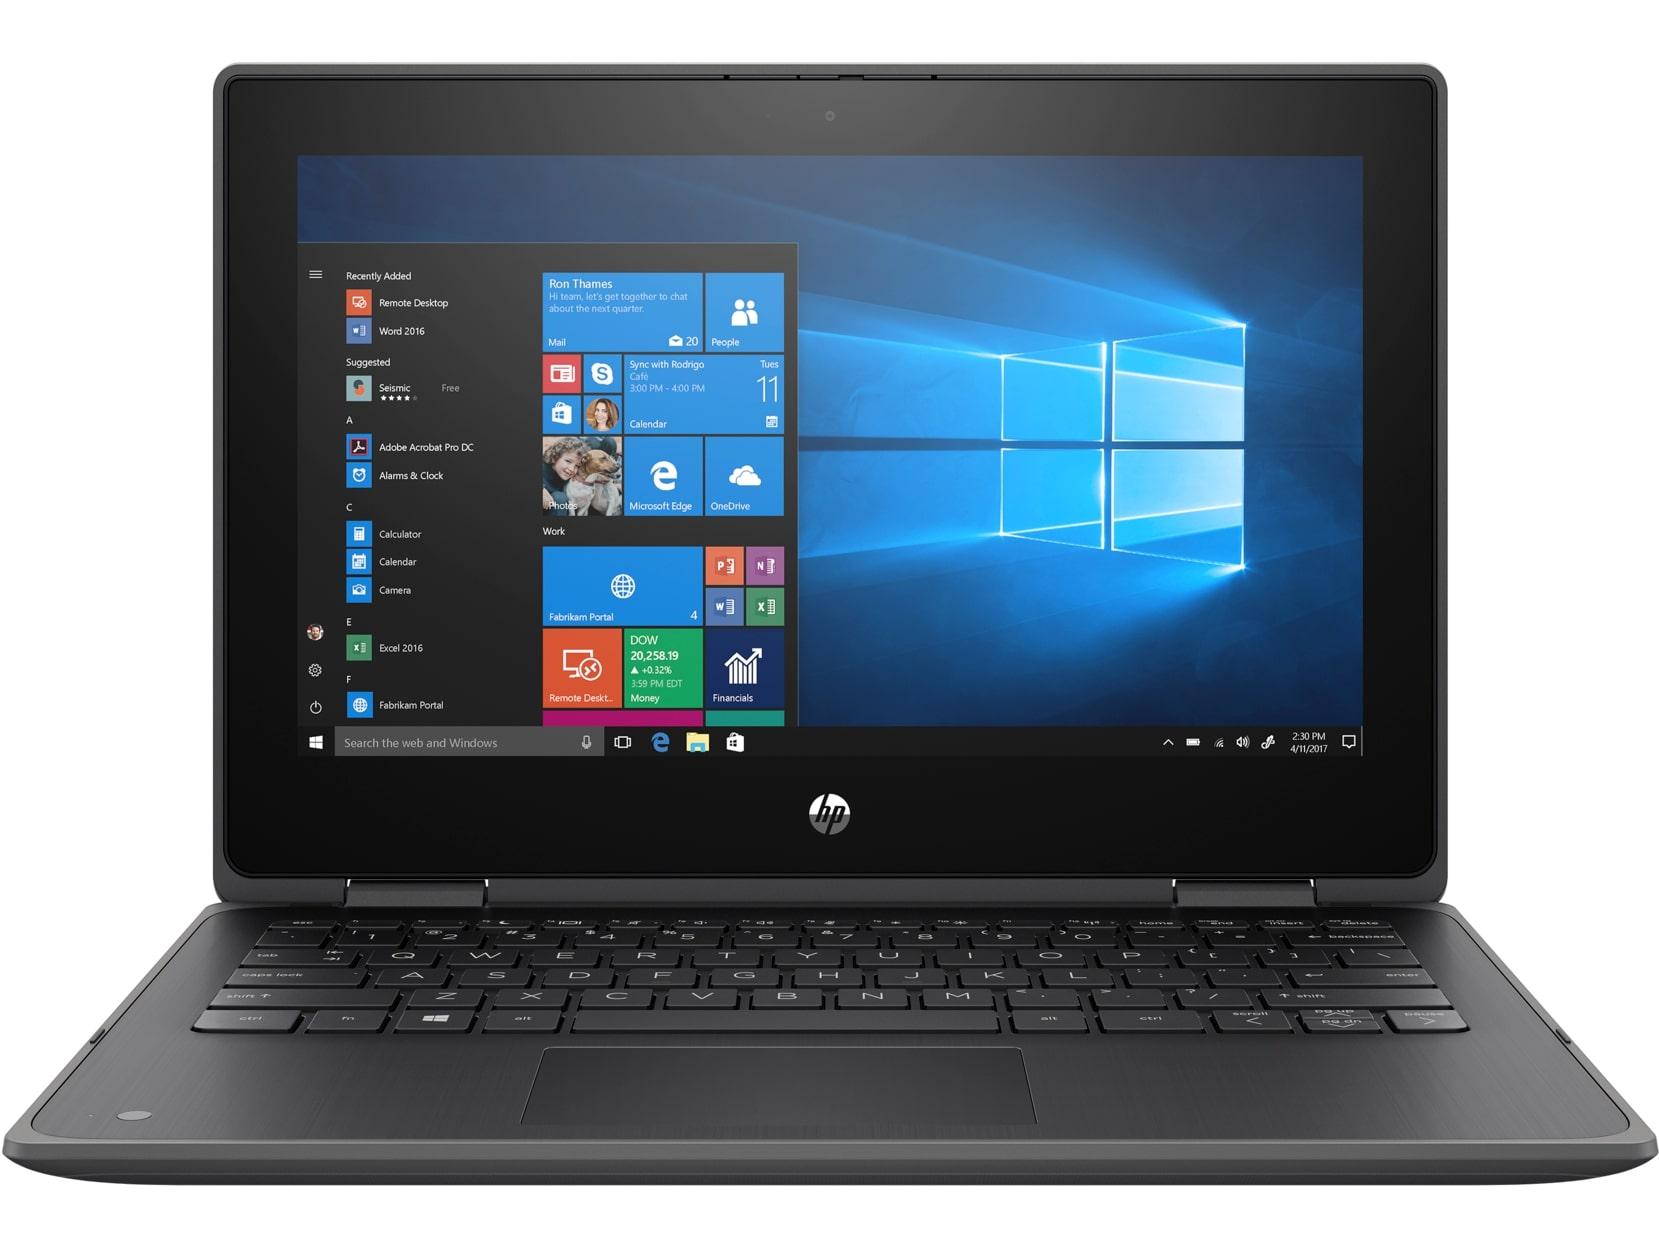 HP ProBook x360 11 G5, Pentium Silver N5030, 11.6 HD/Touch, UMA, 8GB, SSD 256GB, W10, 1-1-0, Gray